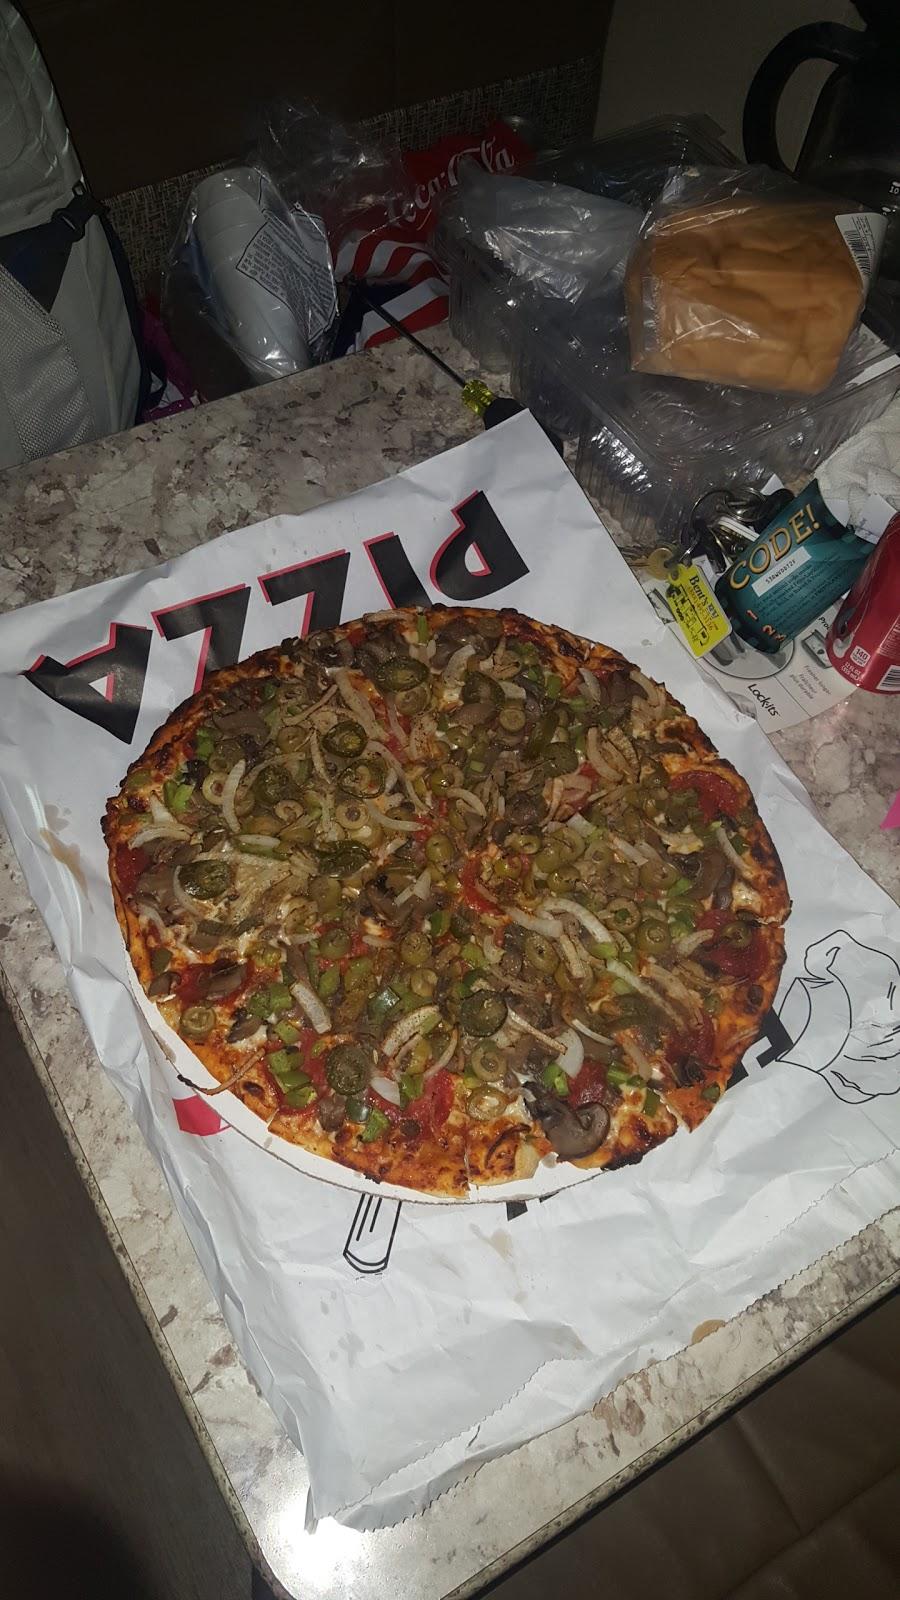 Dans Pizza   restaurant   808 Iowa Ave, Onawa, IA 51040, USA   7124333267 OR +1 712-433-3267